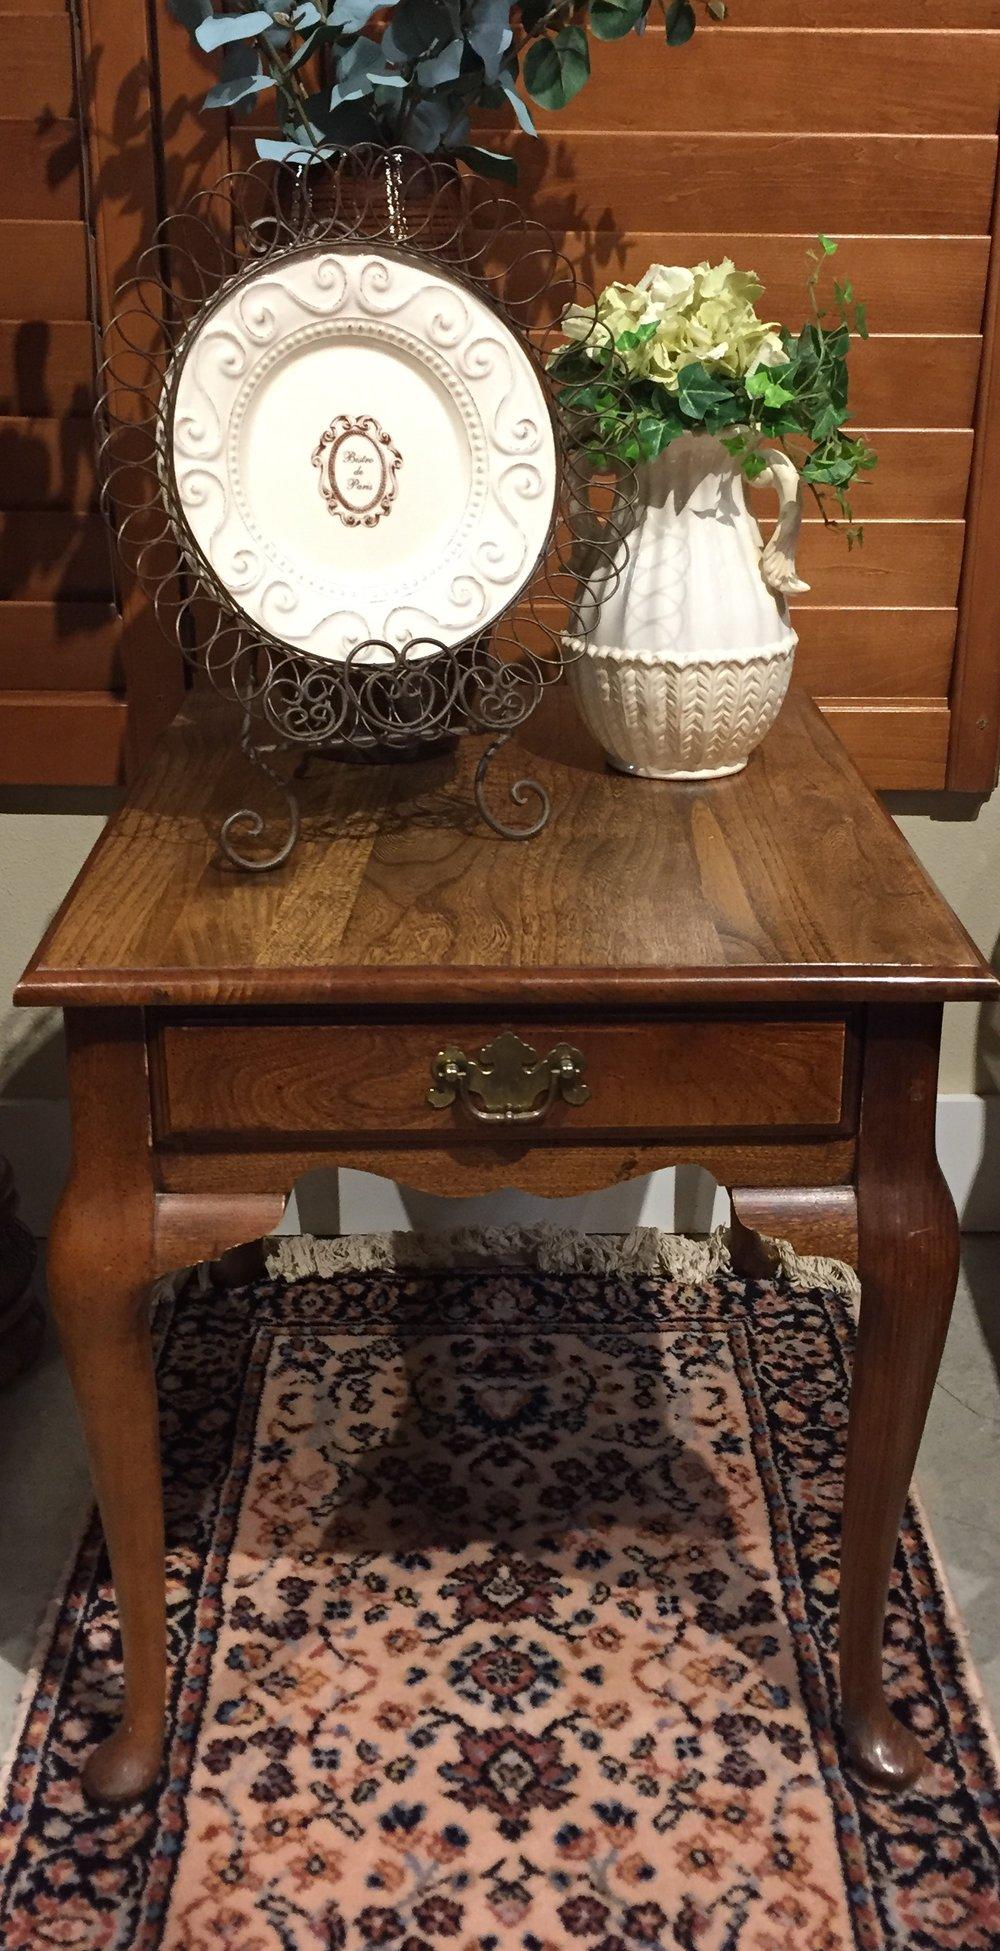 Light Wood End Table $59.95 - 14169